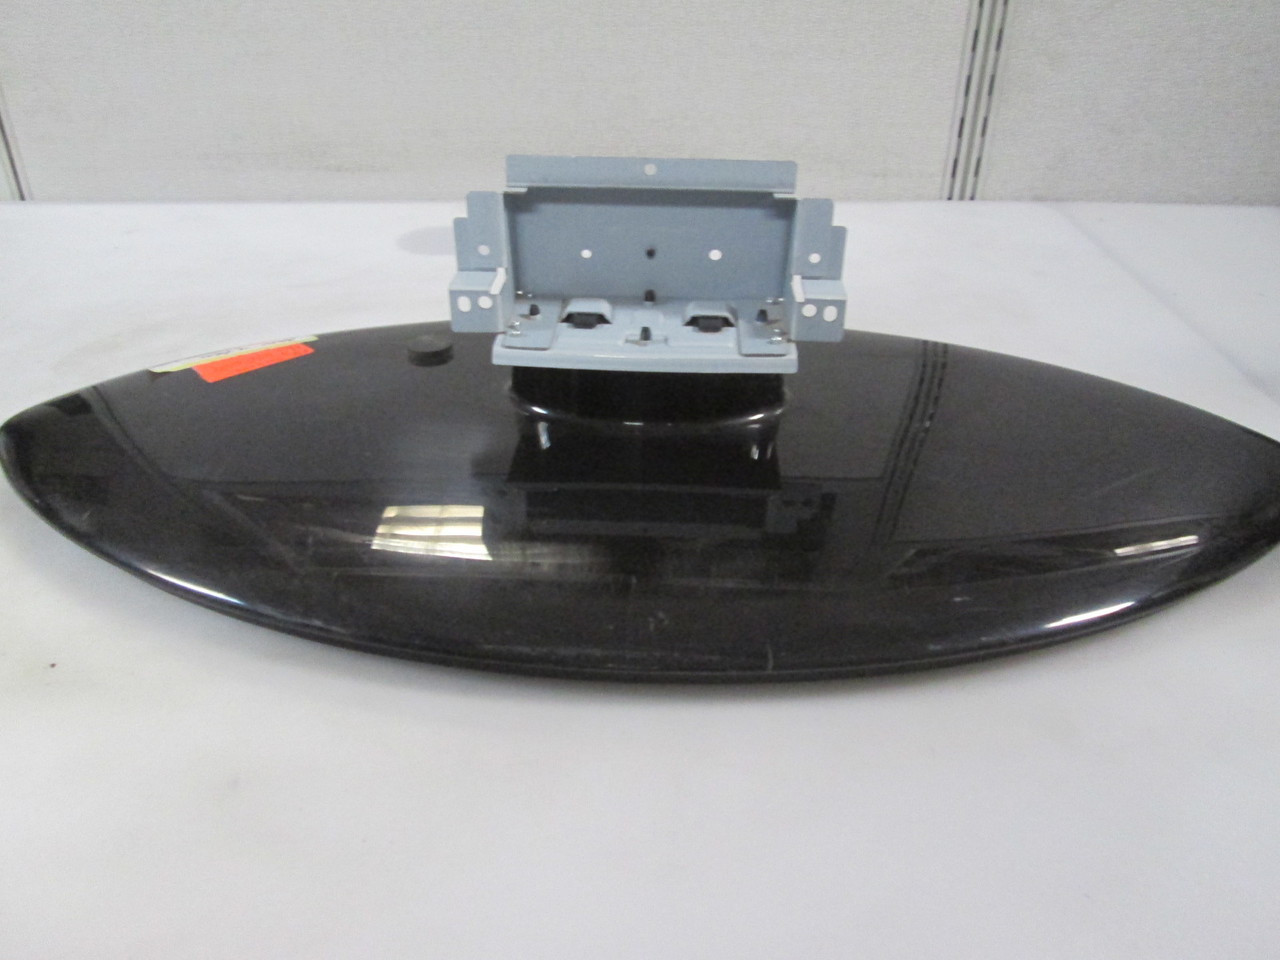 Toshiba 40E210U Complete Screw Set for Base Stand Pedestal and Neck